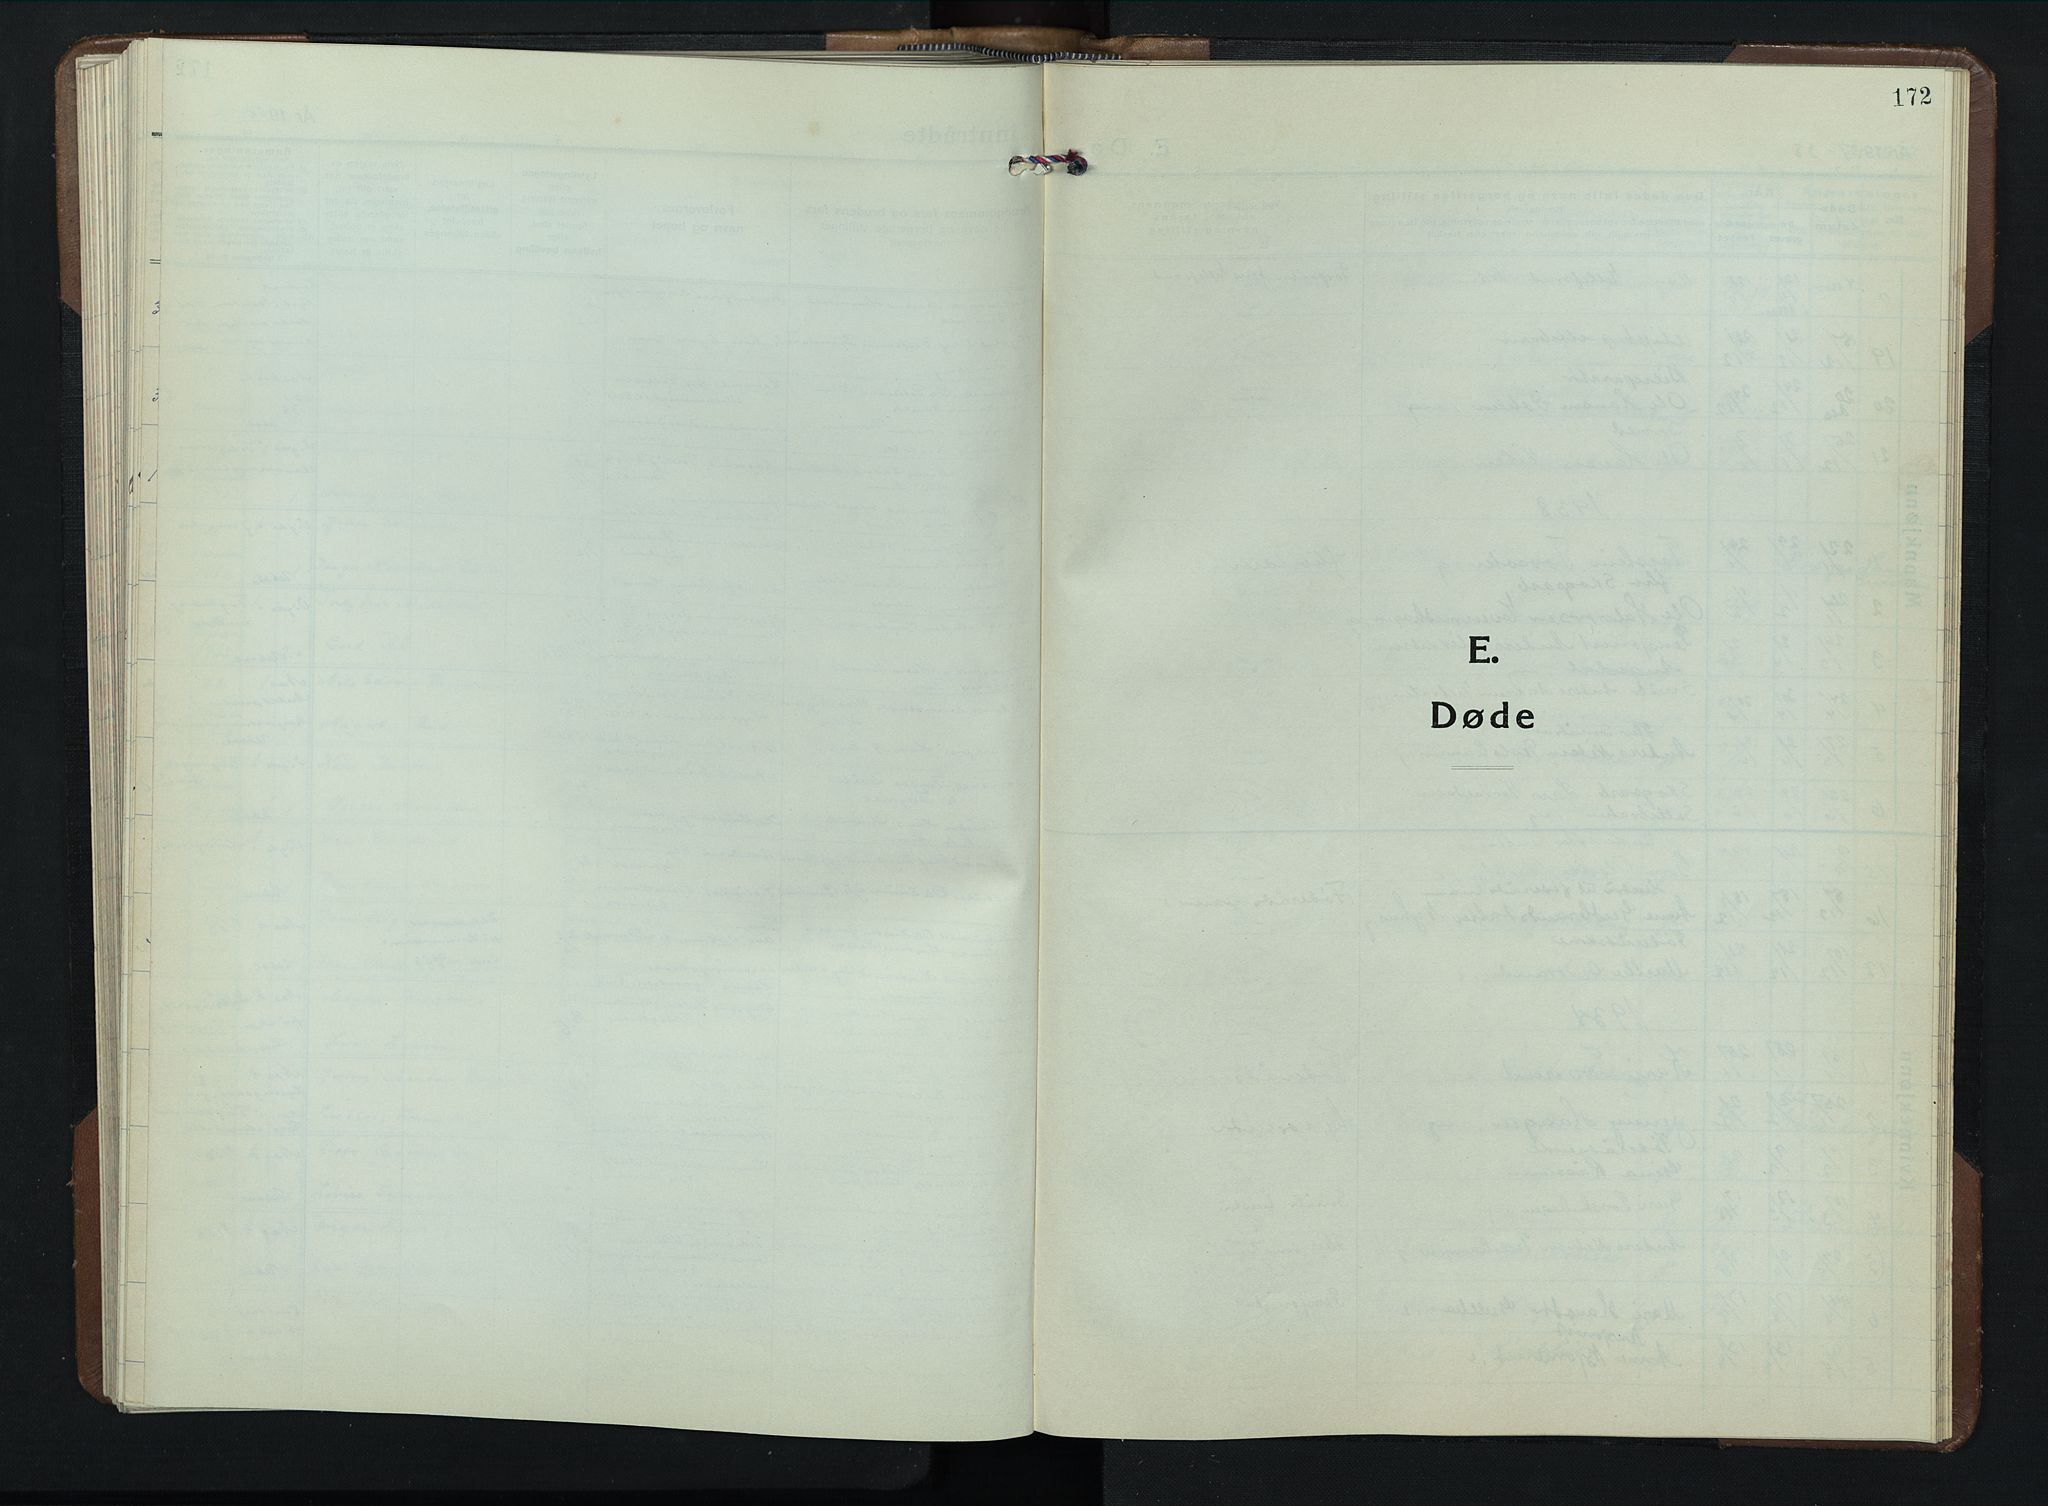 SAH, Brandbu prestekontor, Klokkerbok nr. 2, 1937-1953, s. 172